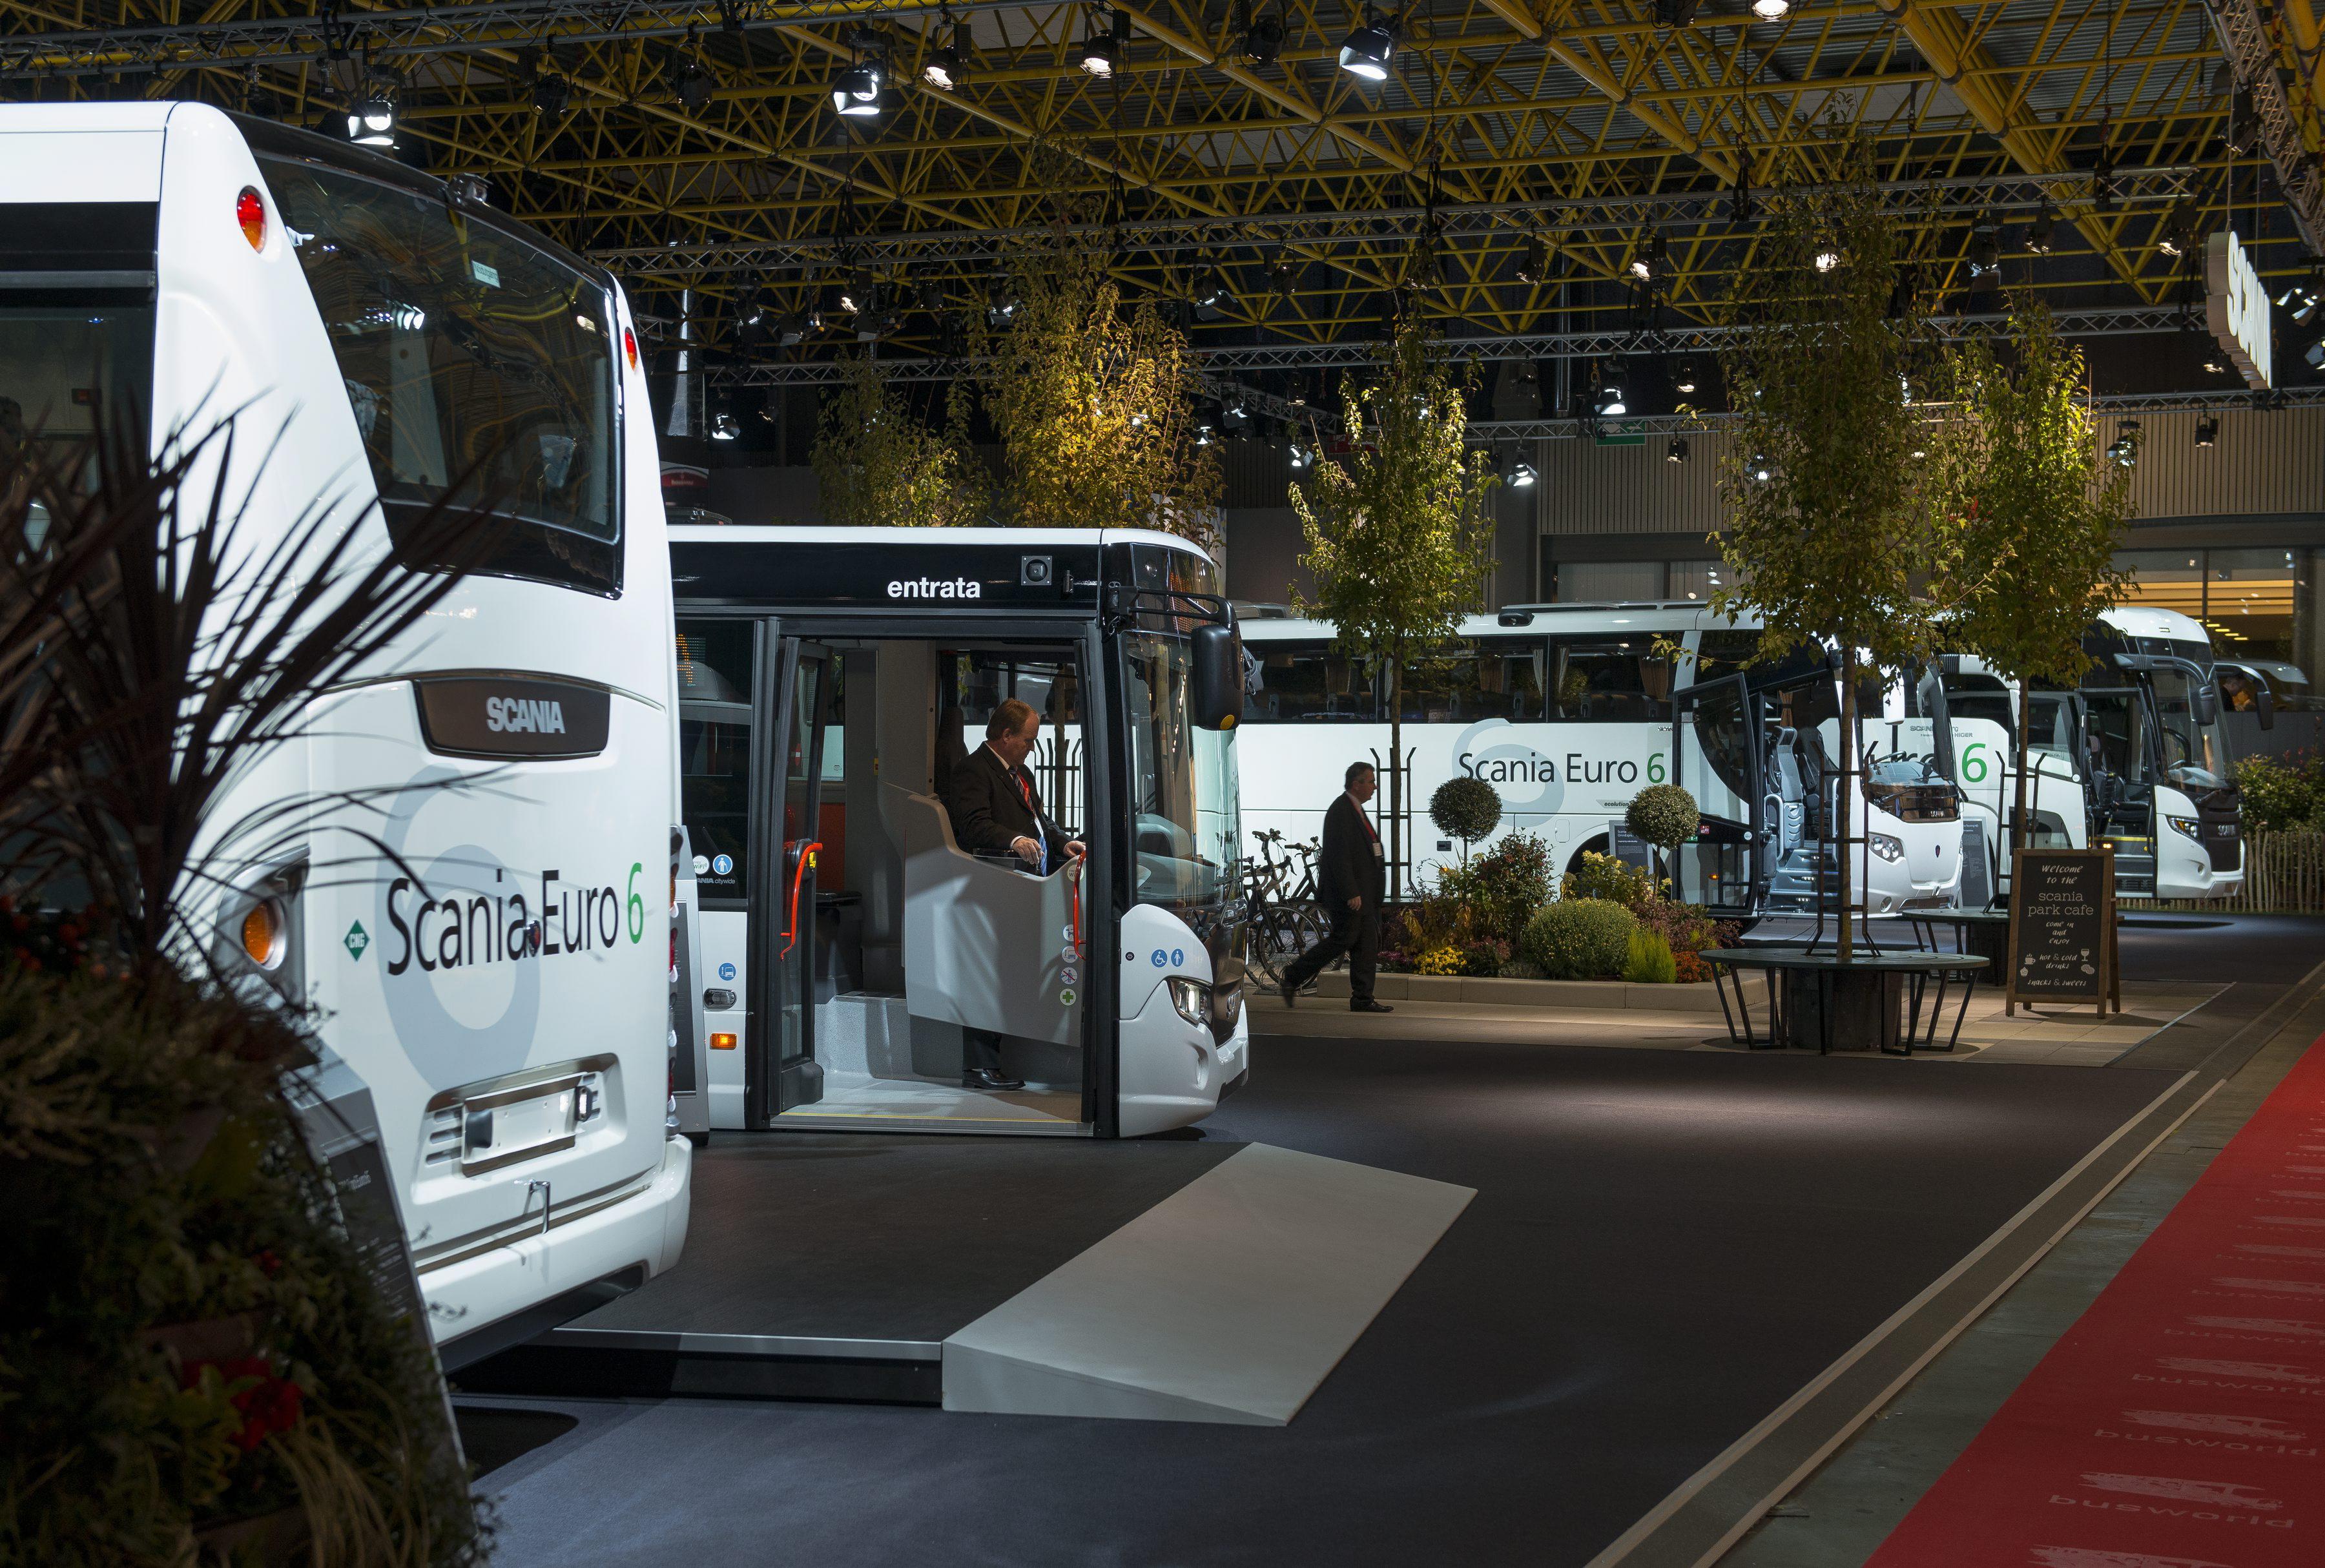 Scania stand at the Busworld Exhibition 2013 Kortrijk, Belgium Photo: Dan Boman 2013